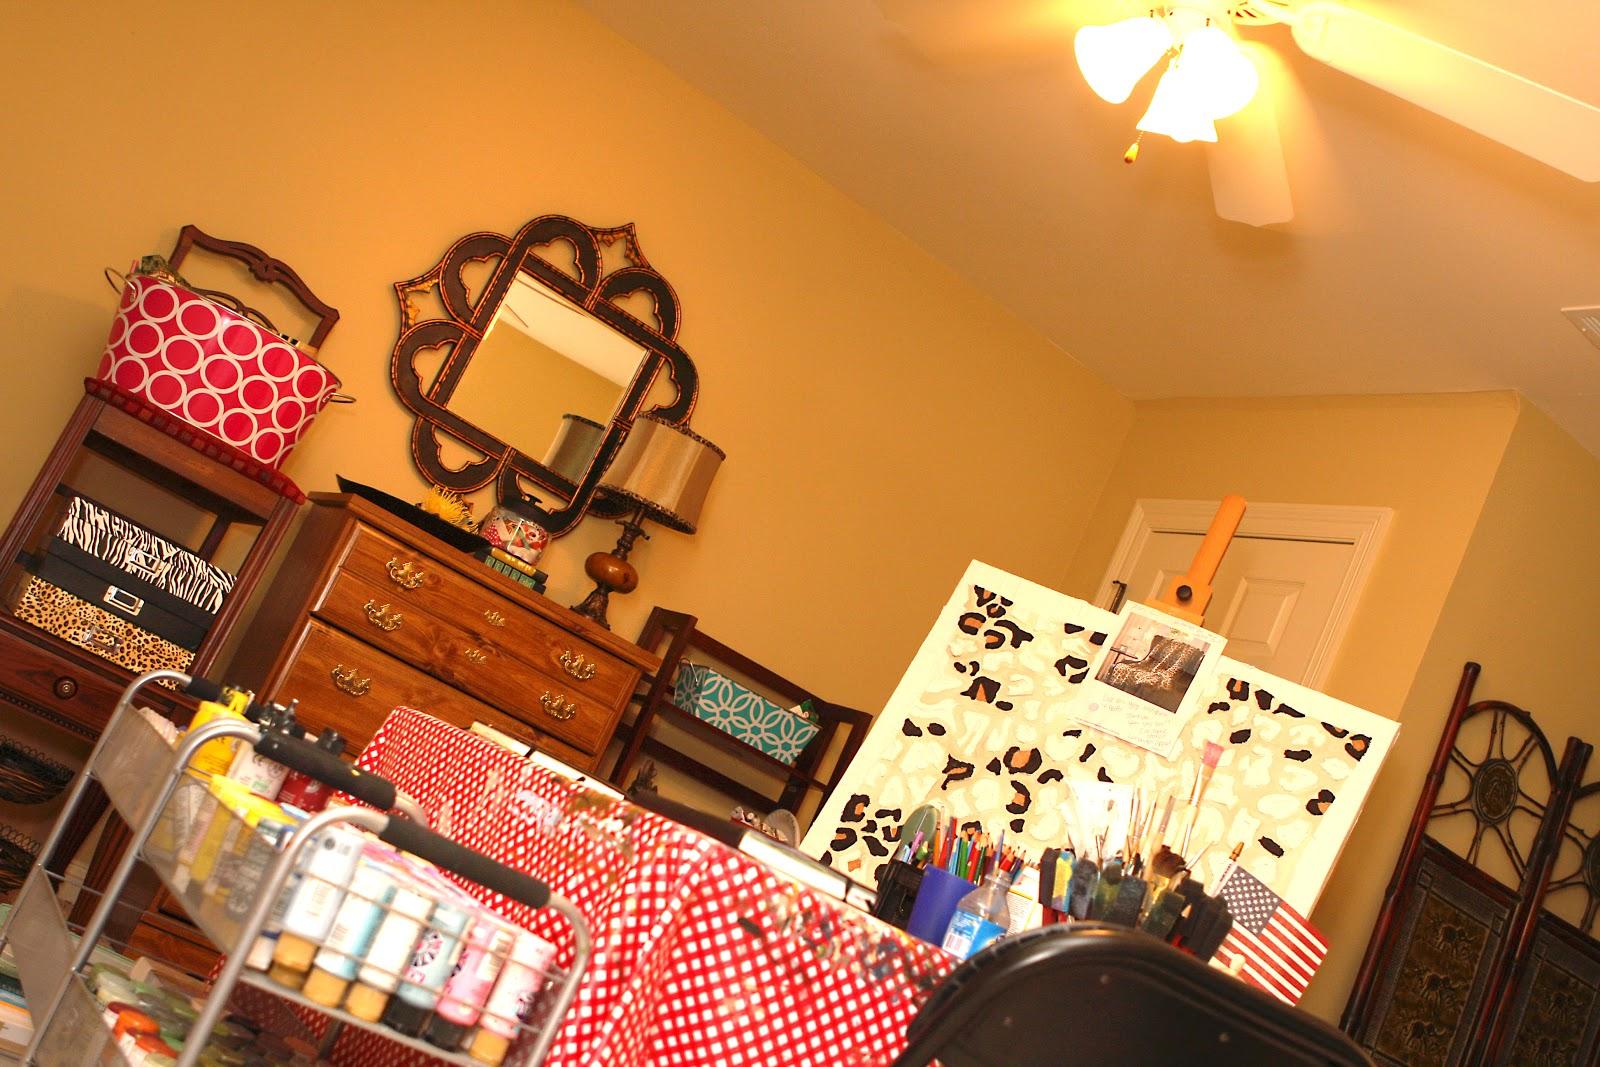 http://2.bp.blogspot.com/-j1a7G3BPlEM/TjjRqAbUNyI/AAAAAAAAAW0/jsDxrsvne24/s1600/art+room+002.jpg